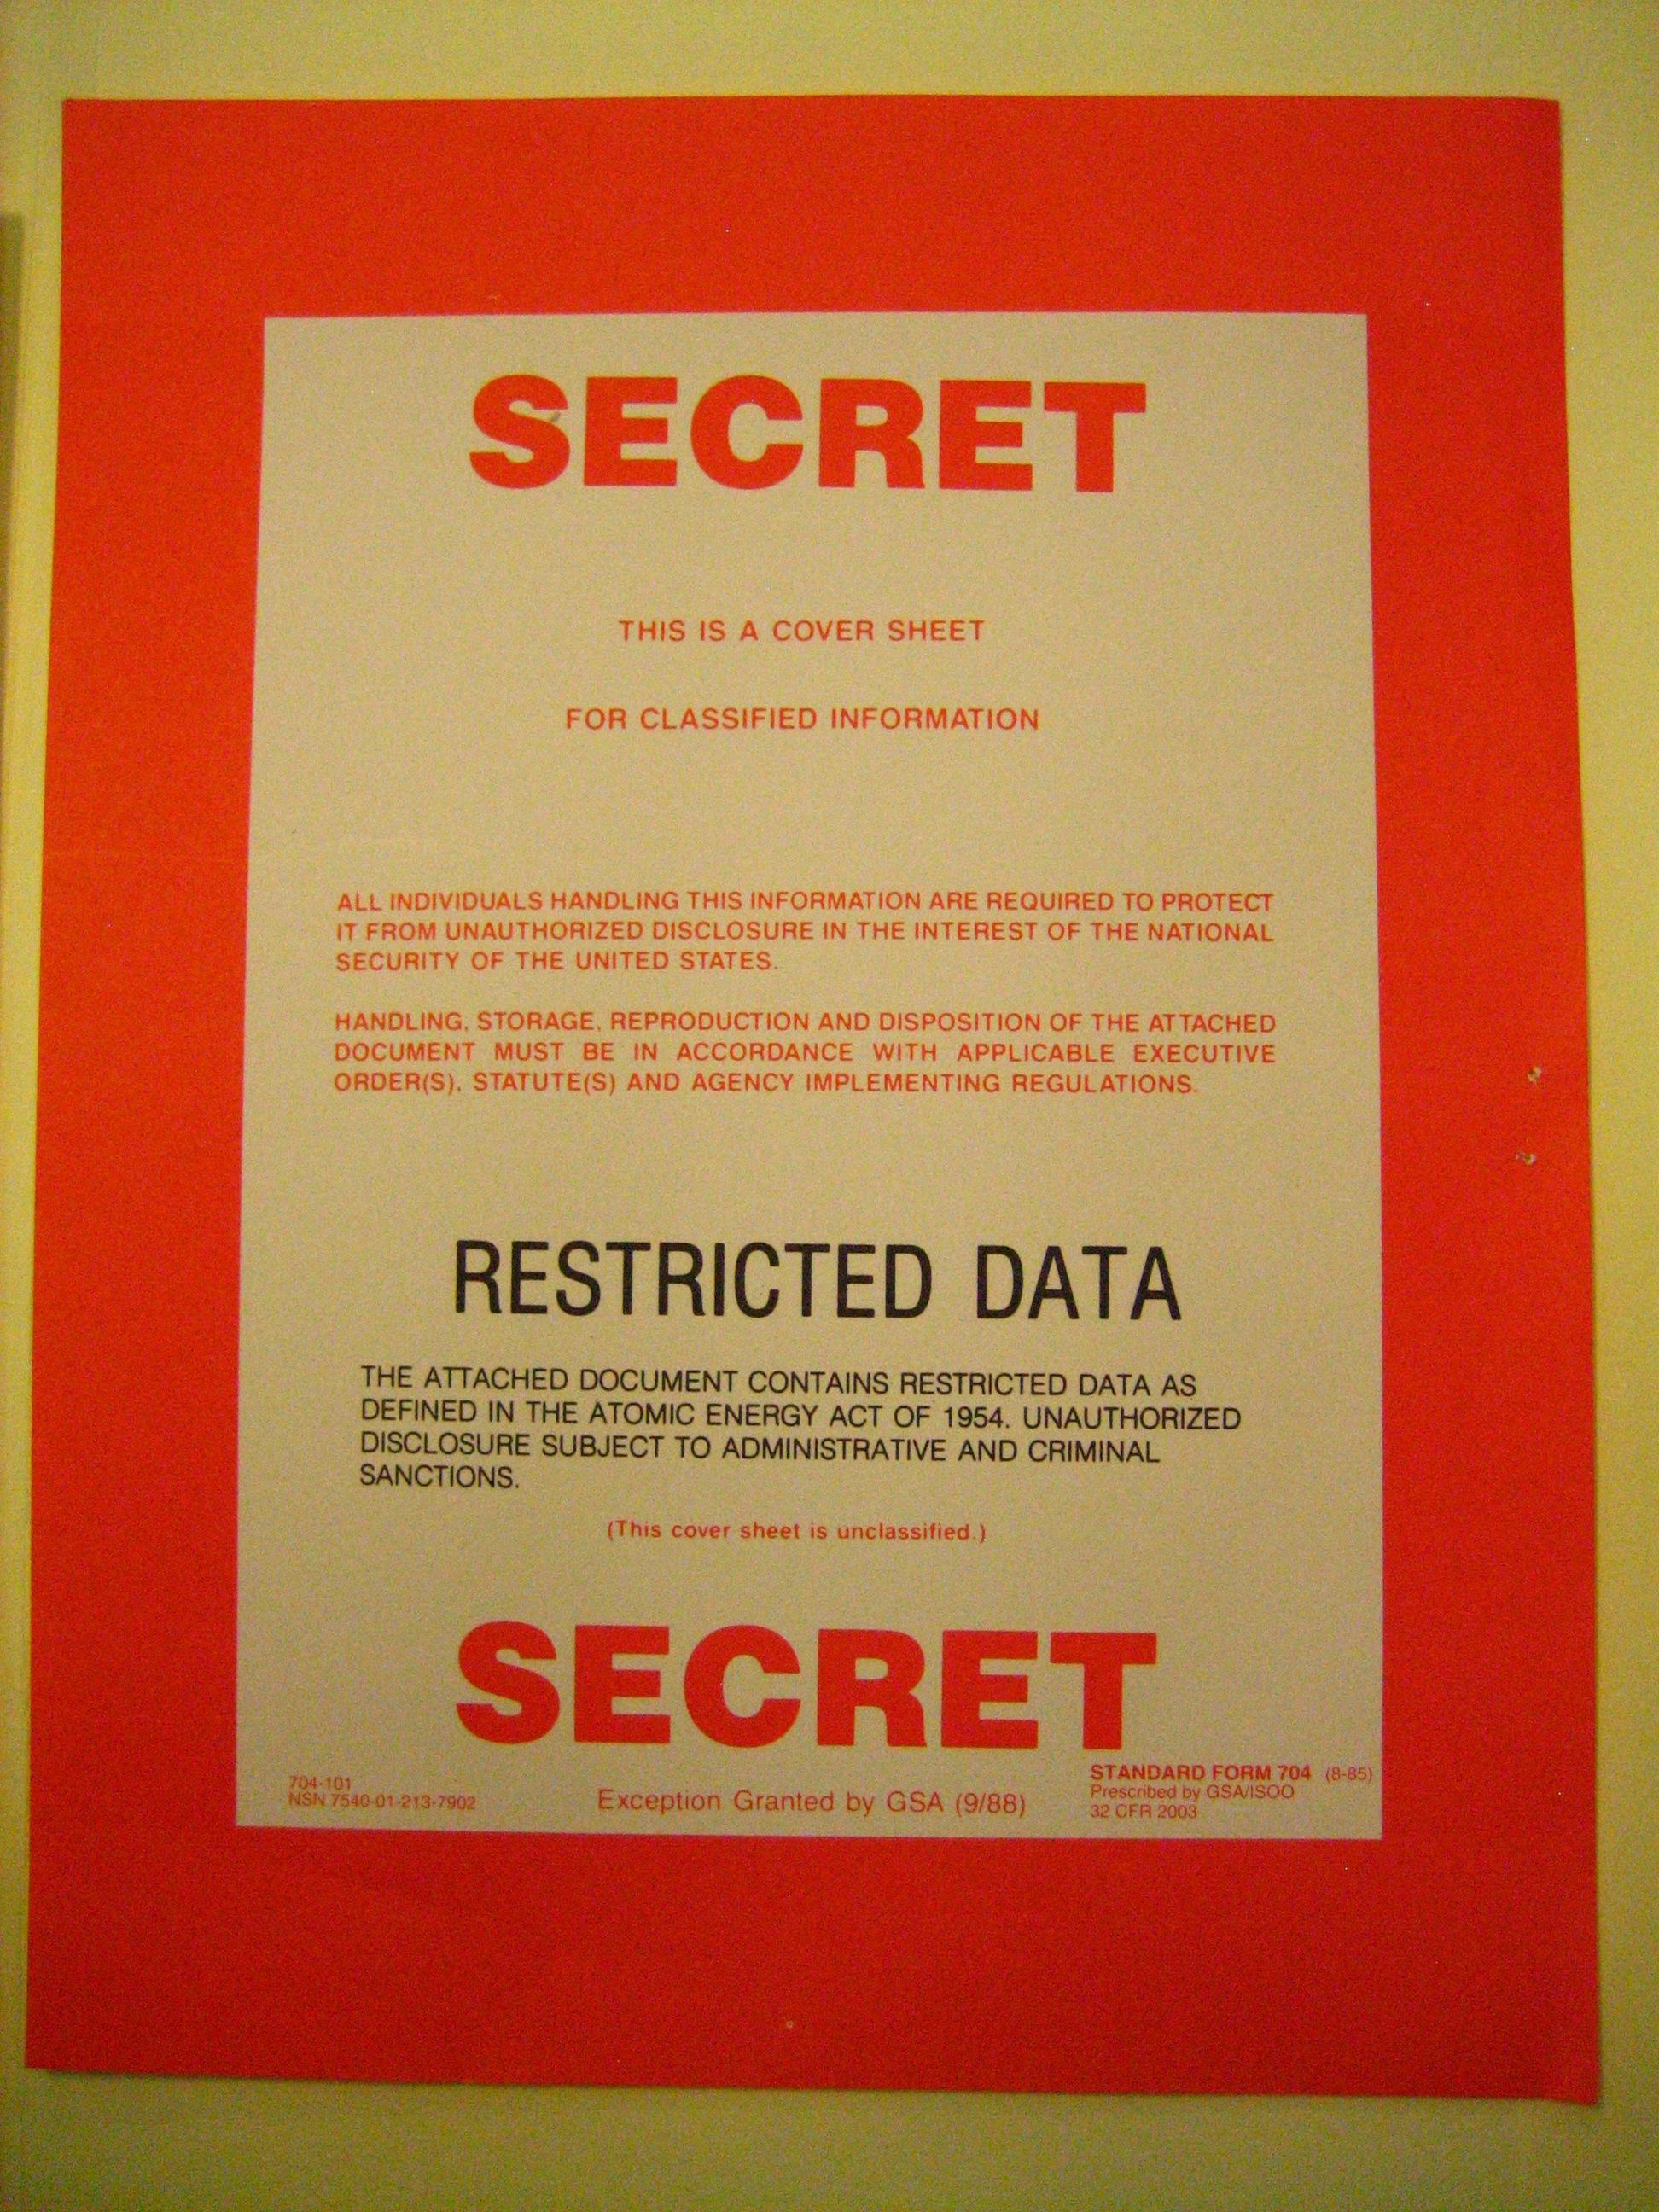 sf-704 secret document cover sheet